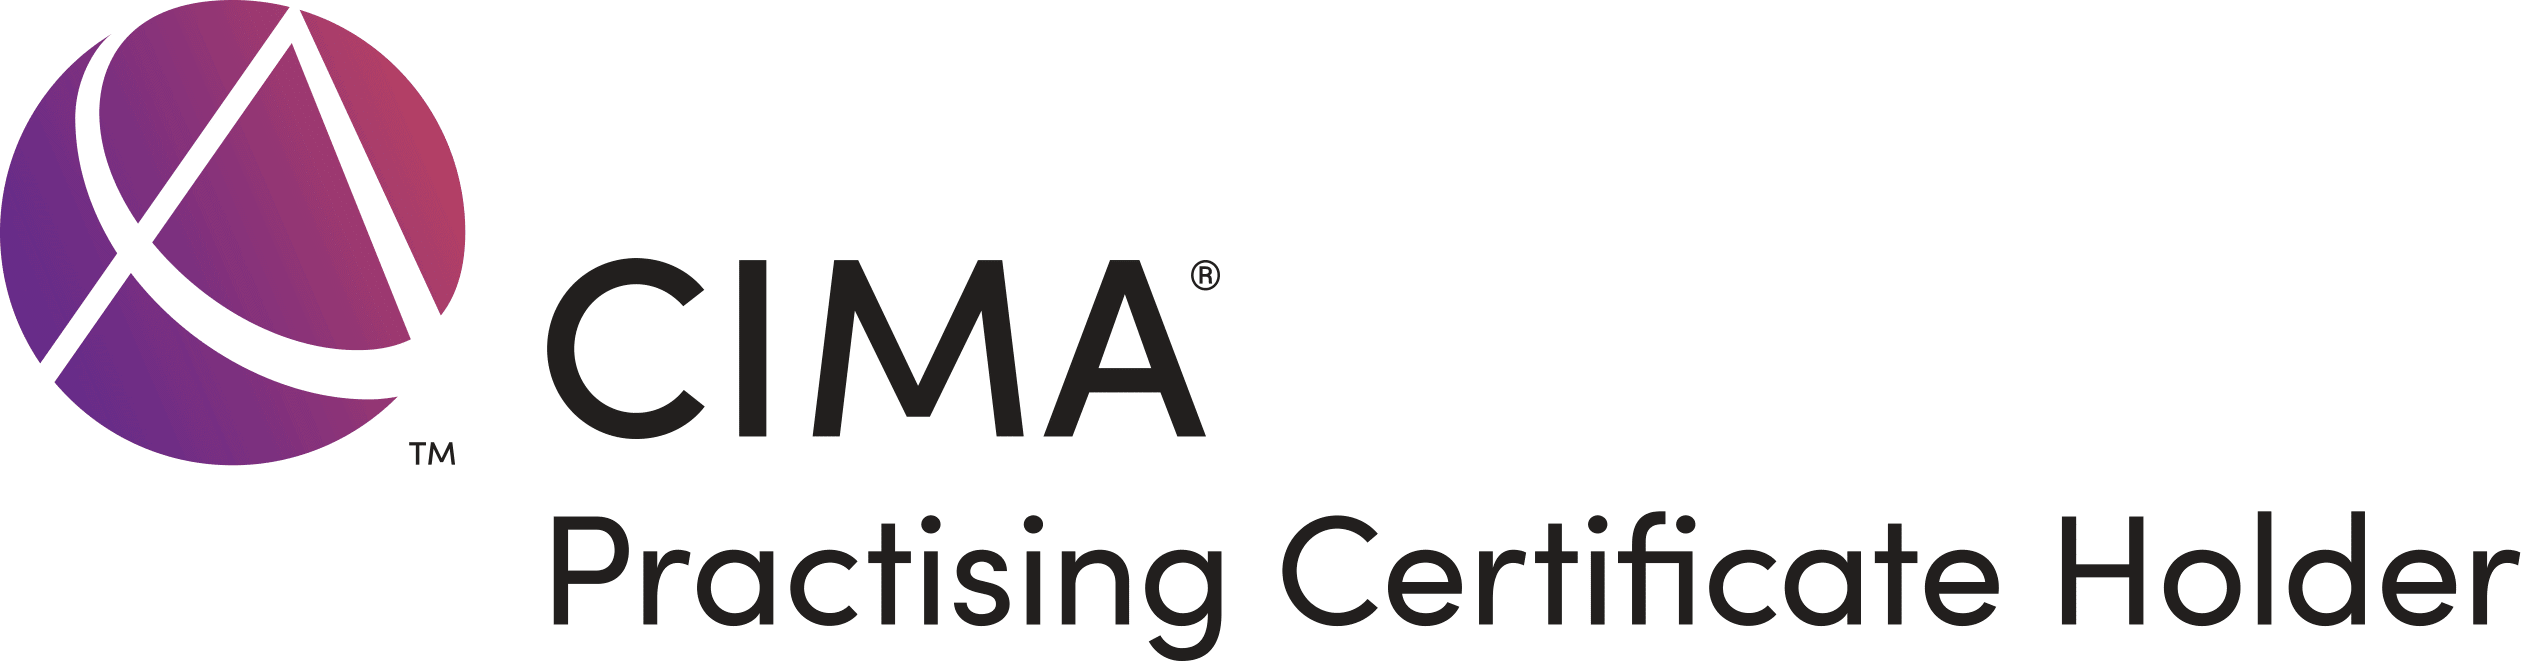 CIMA Partner - Rodliffe Accounting